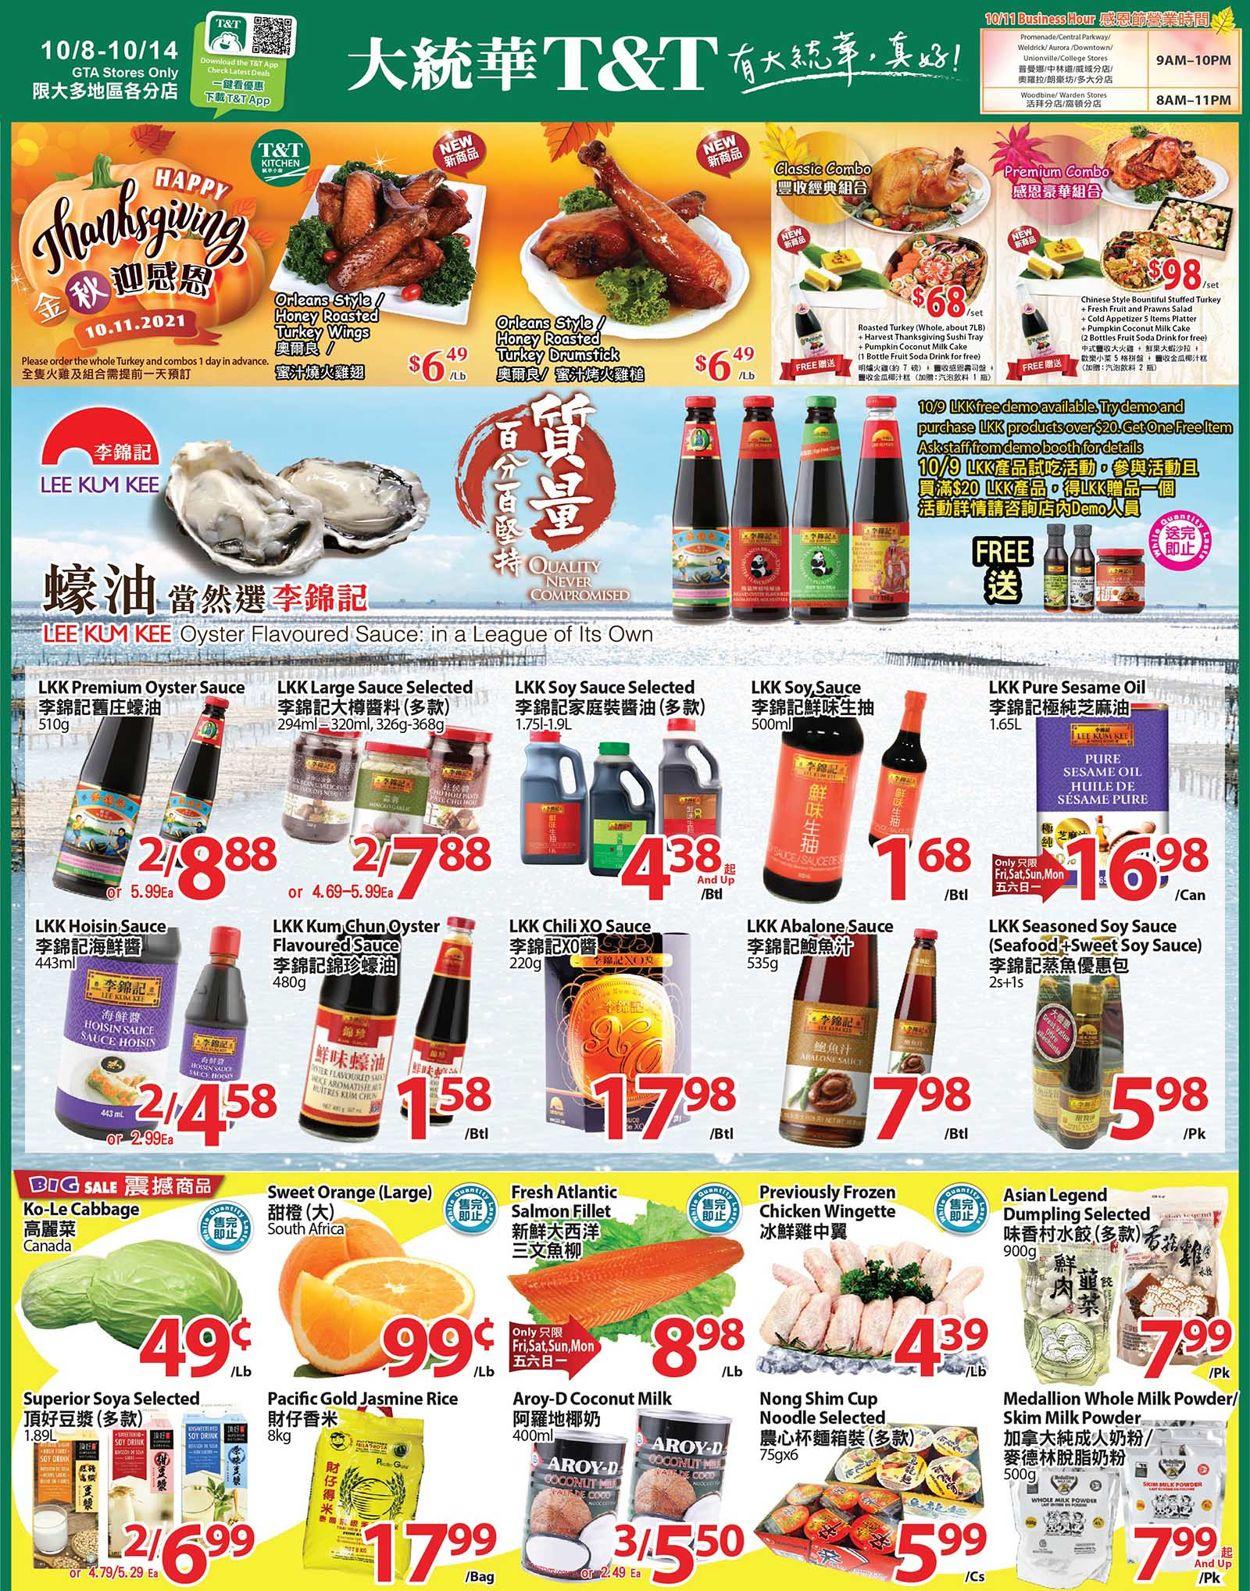 T&T Supermarket - Greater Toronto Area Flyer - 10/08-10/14/2021